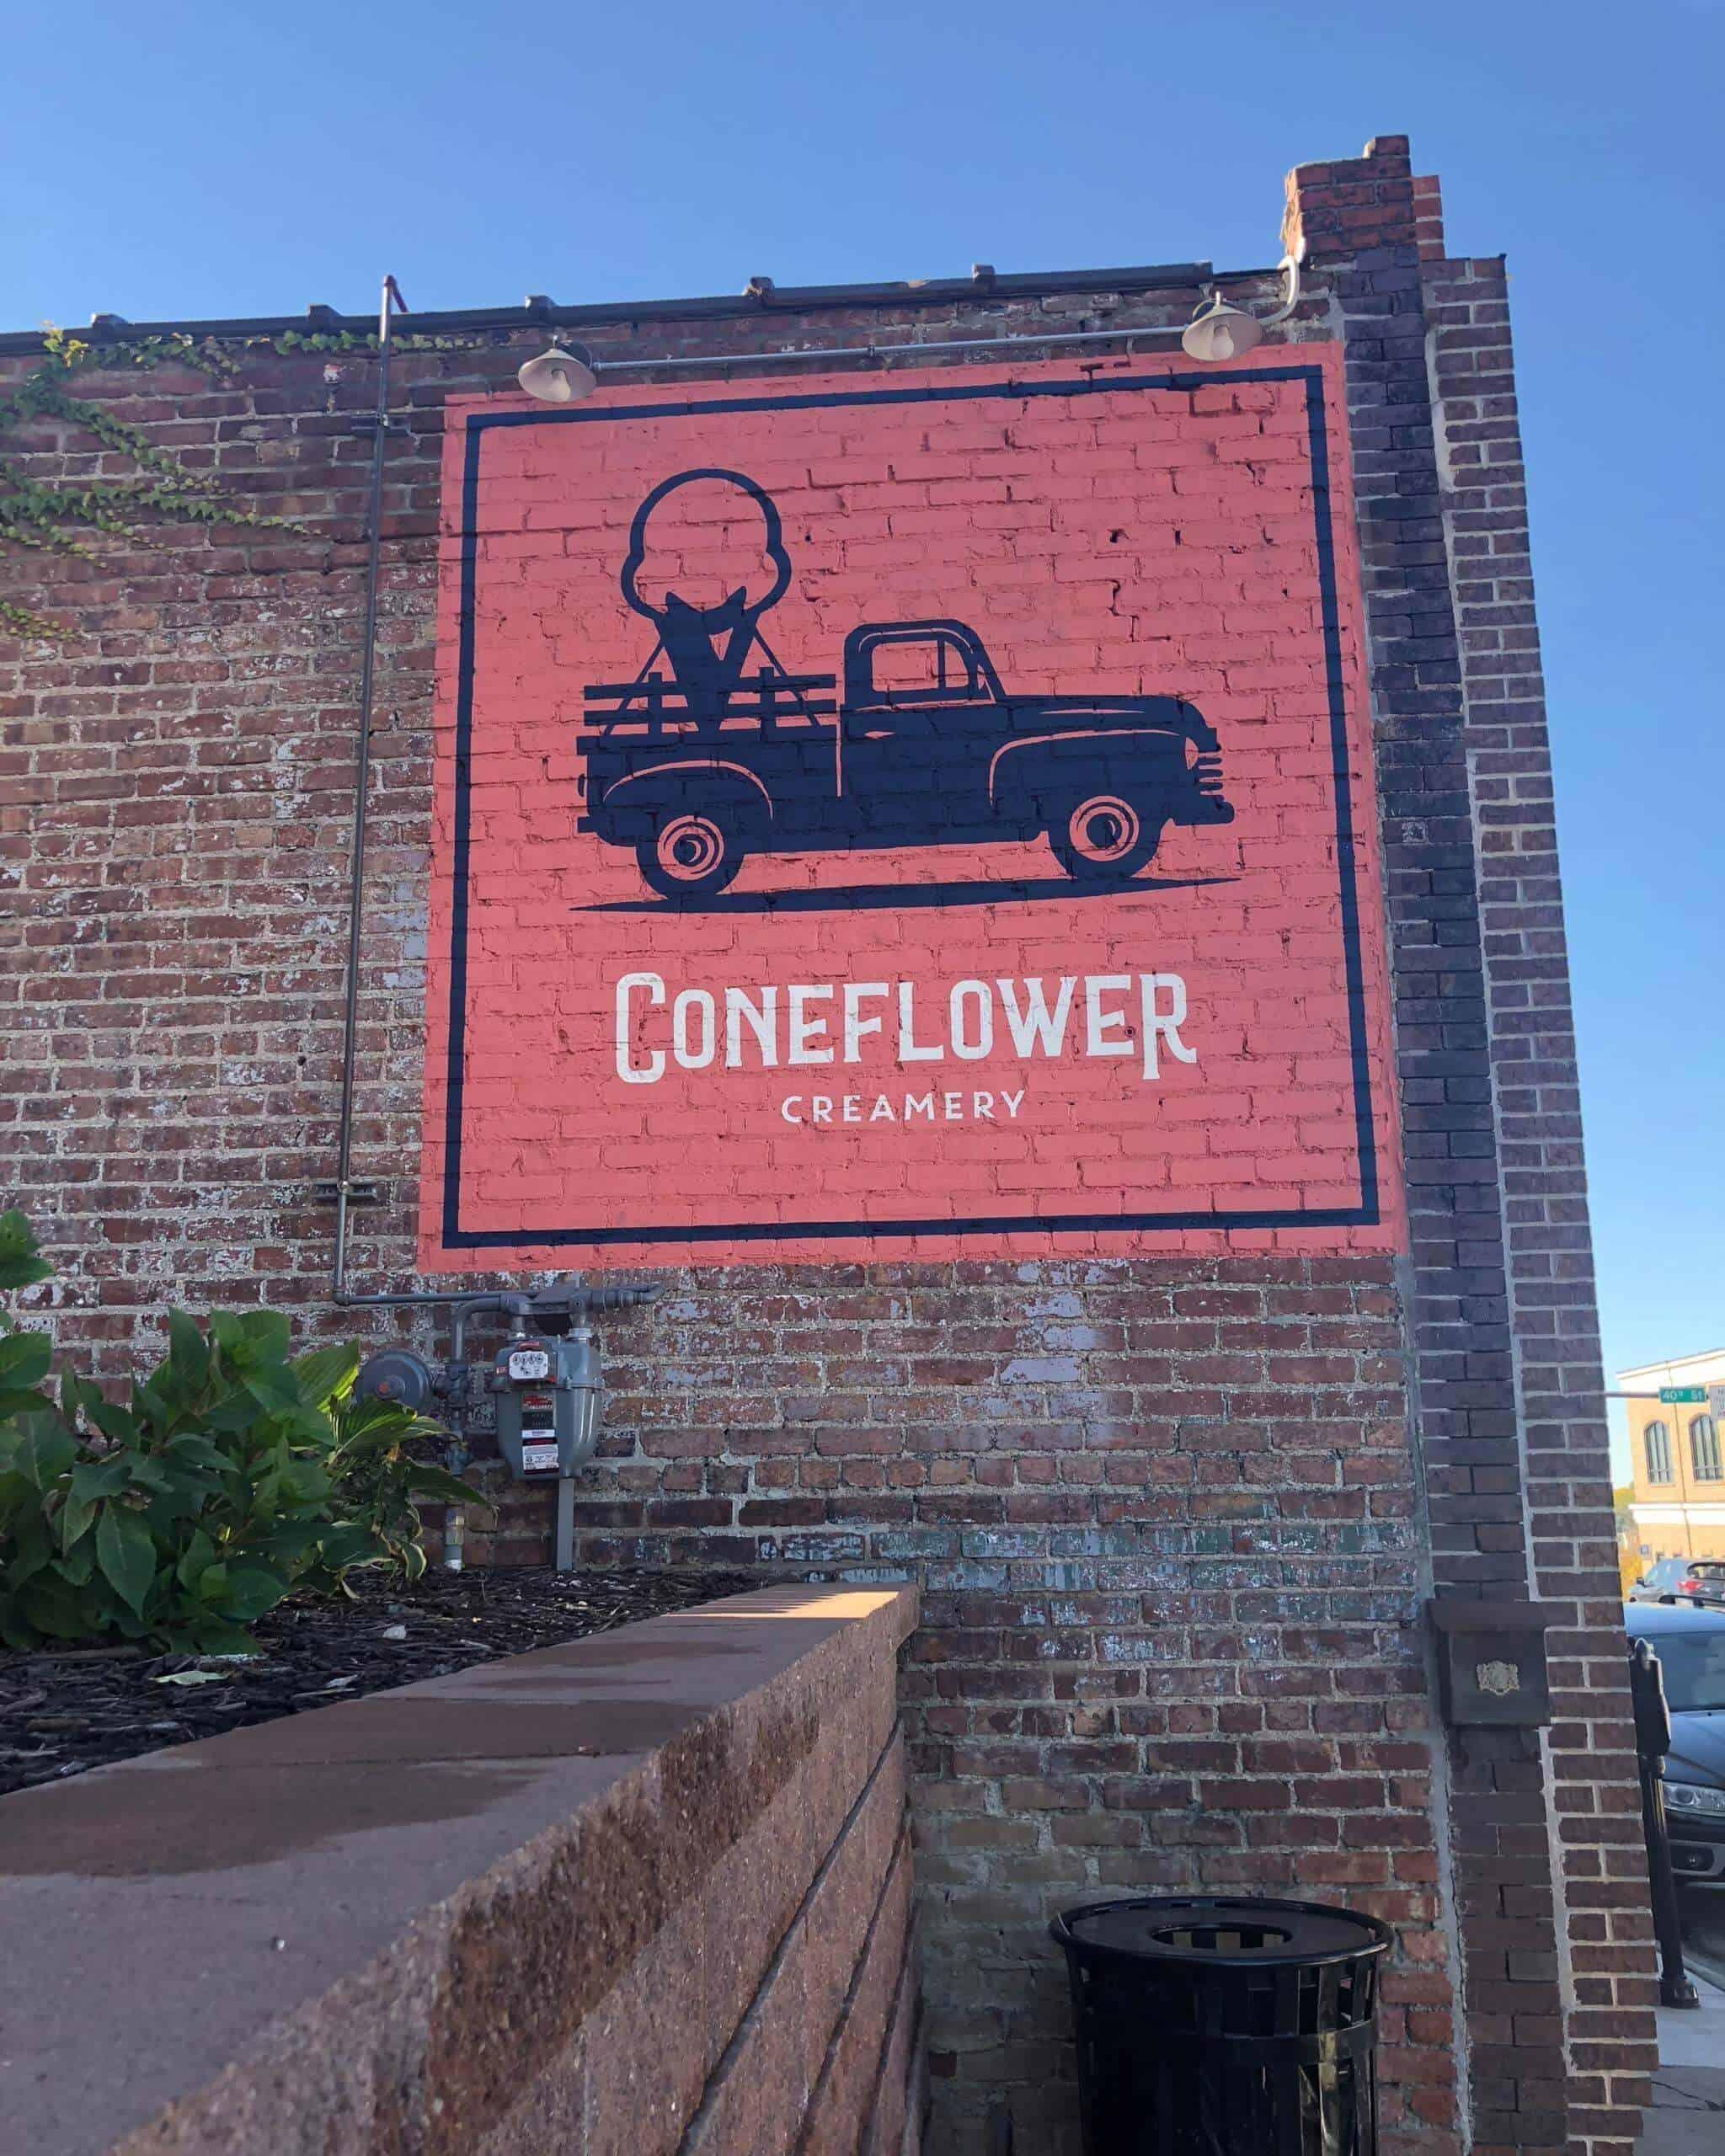 Sign of Coneflower Creamery in Omaha